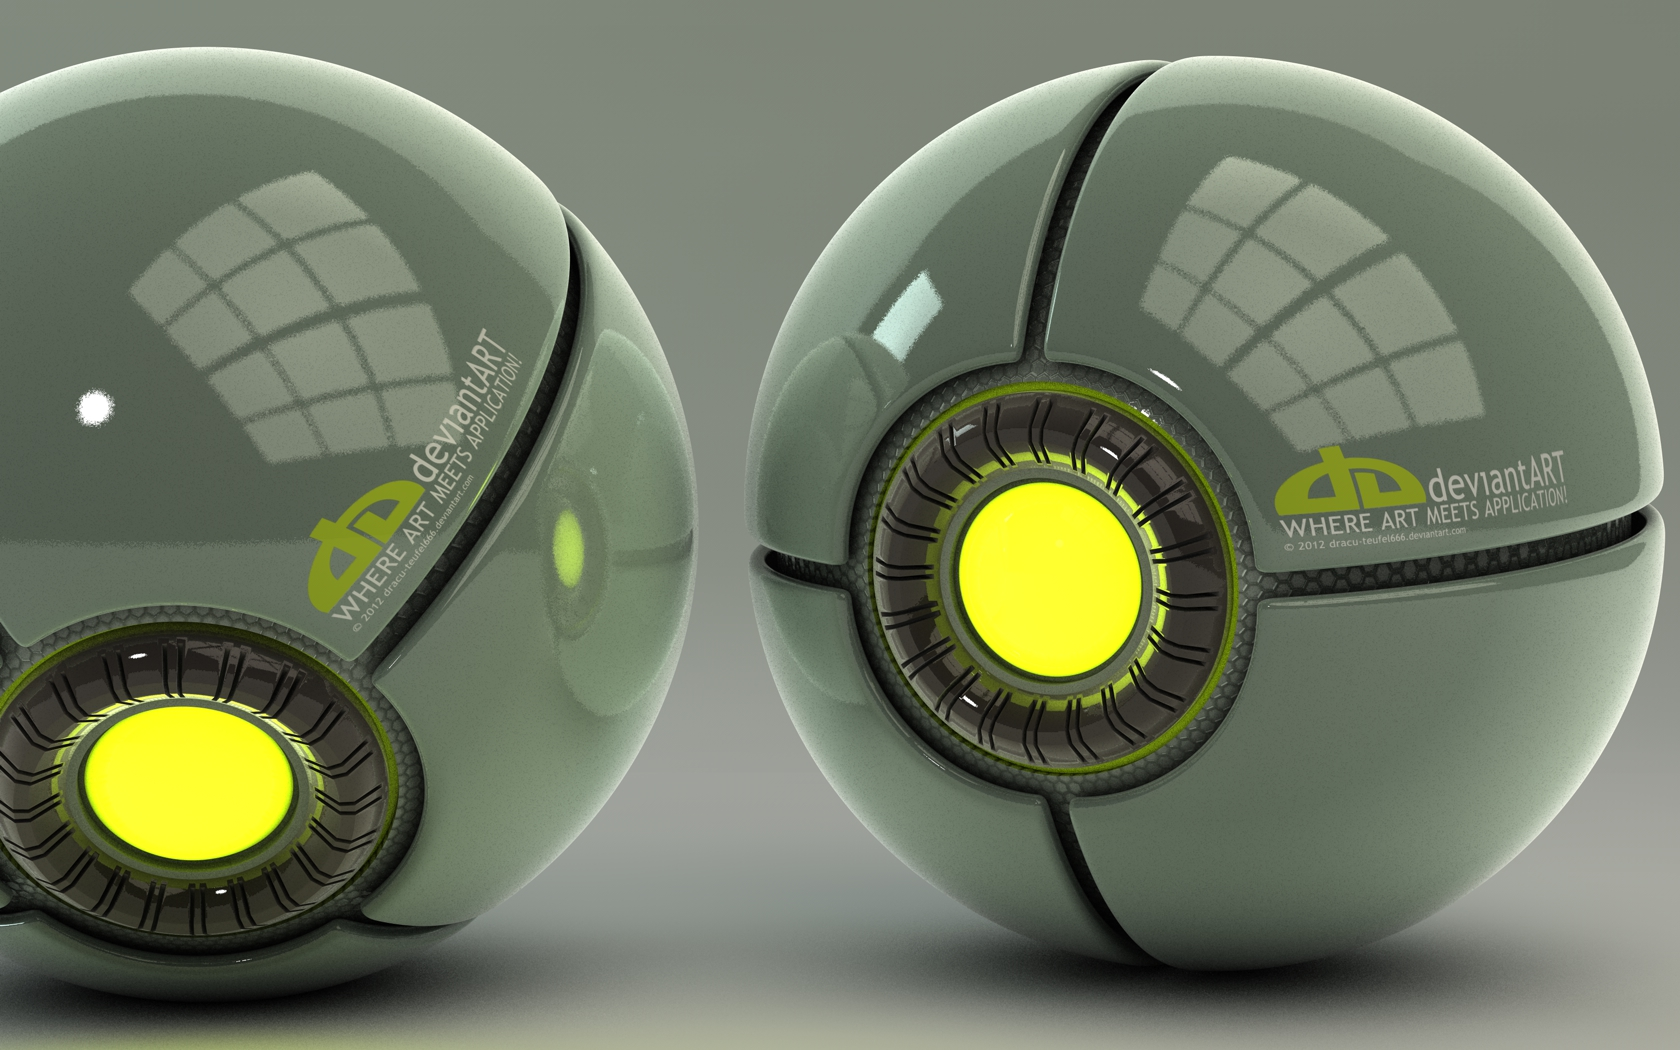 DeviantART glowing Balls by Dracu-Teufel666